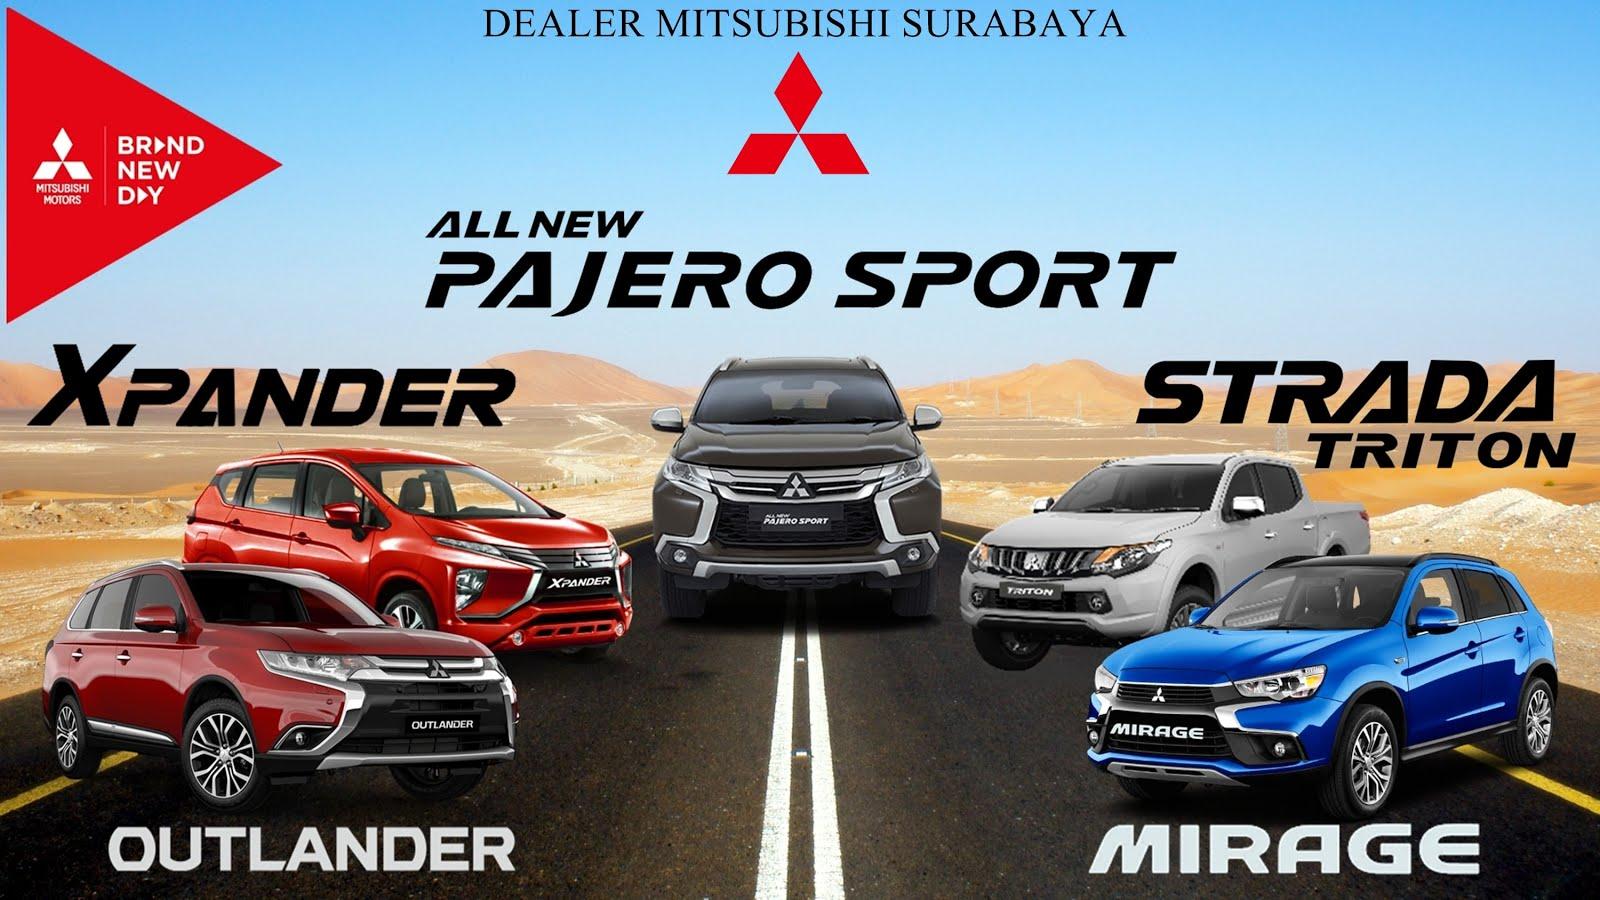 Dealer Mitsubishi Surabaya | 082 333 555 302 | Harga Promo Mitsubishi